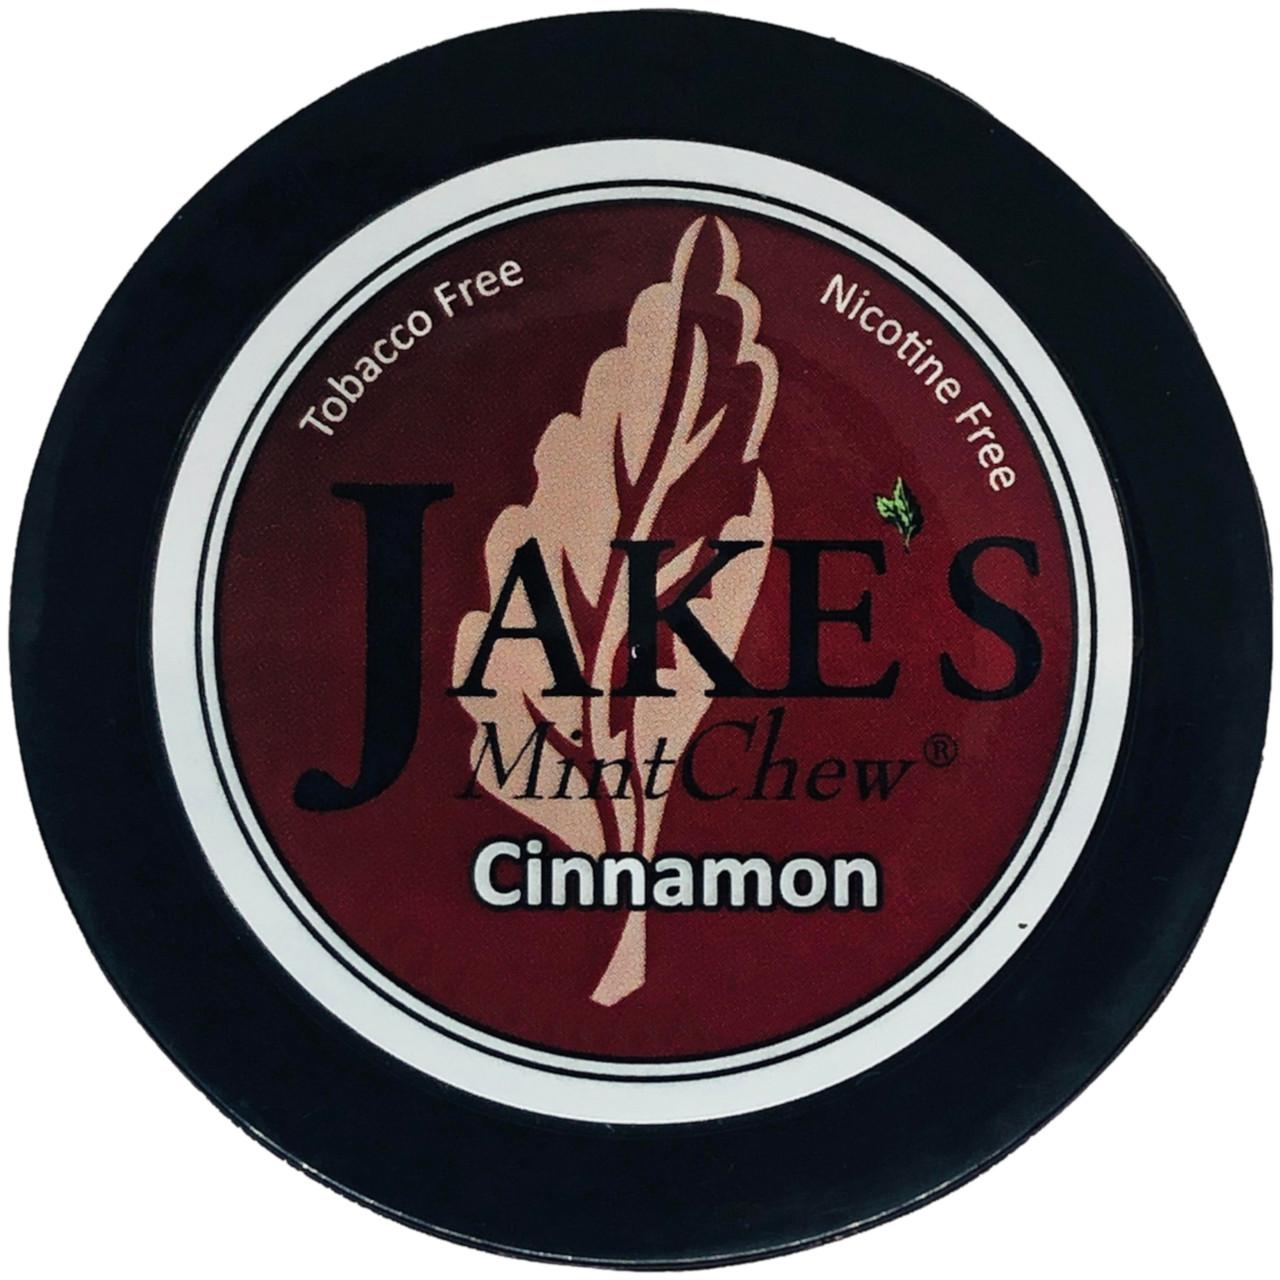 Jake's Mint Herbal Chew Cinnamon 1 Can